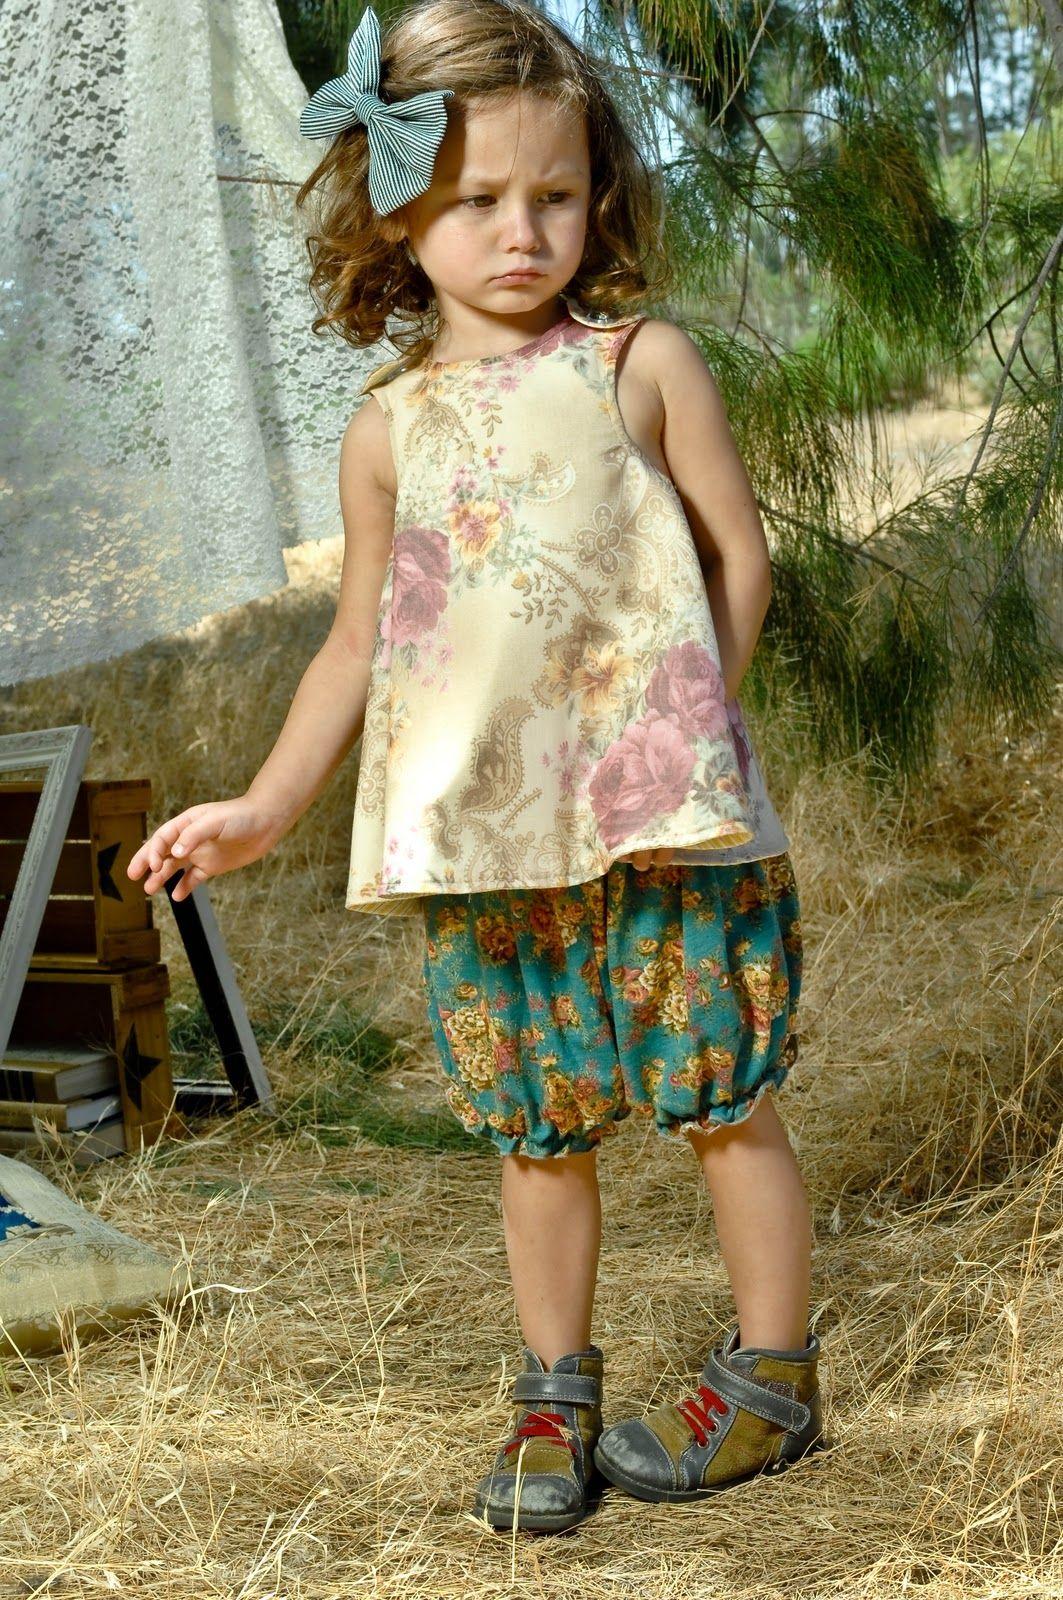 (right bank babies spring 2011 collection) so vintage ! petit look rétro vraiment adorable !